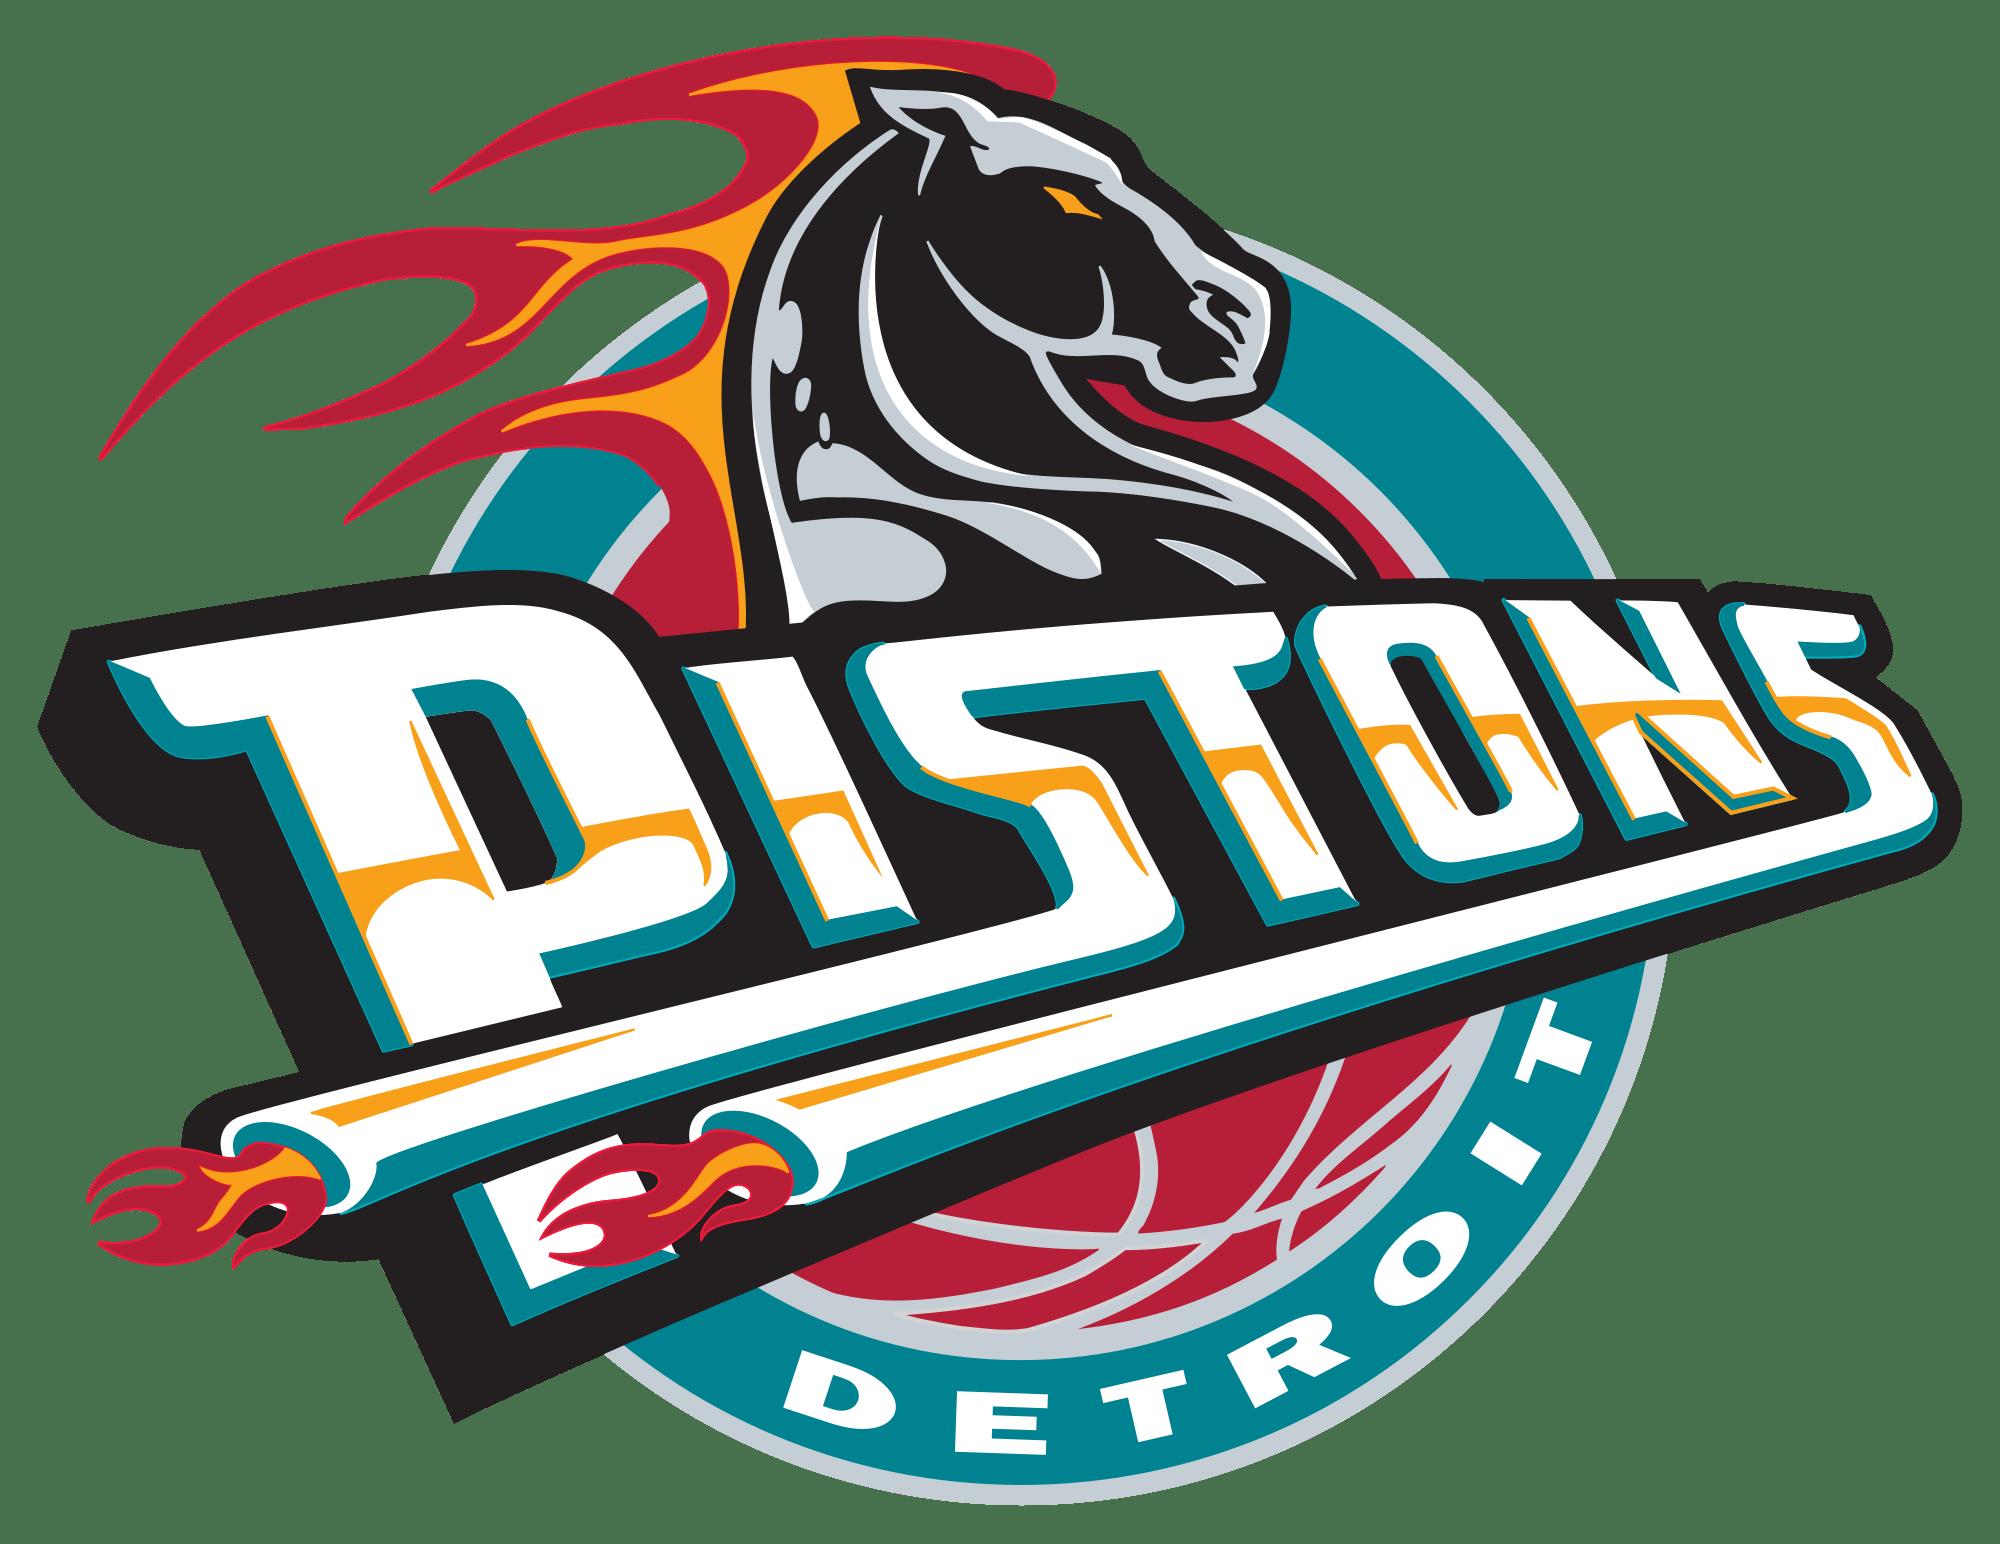 Detroit Pistons Wallpapers Top Free Detroit Pistons Backgrounds Wallpaperaccess